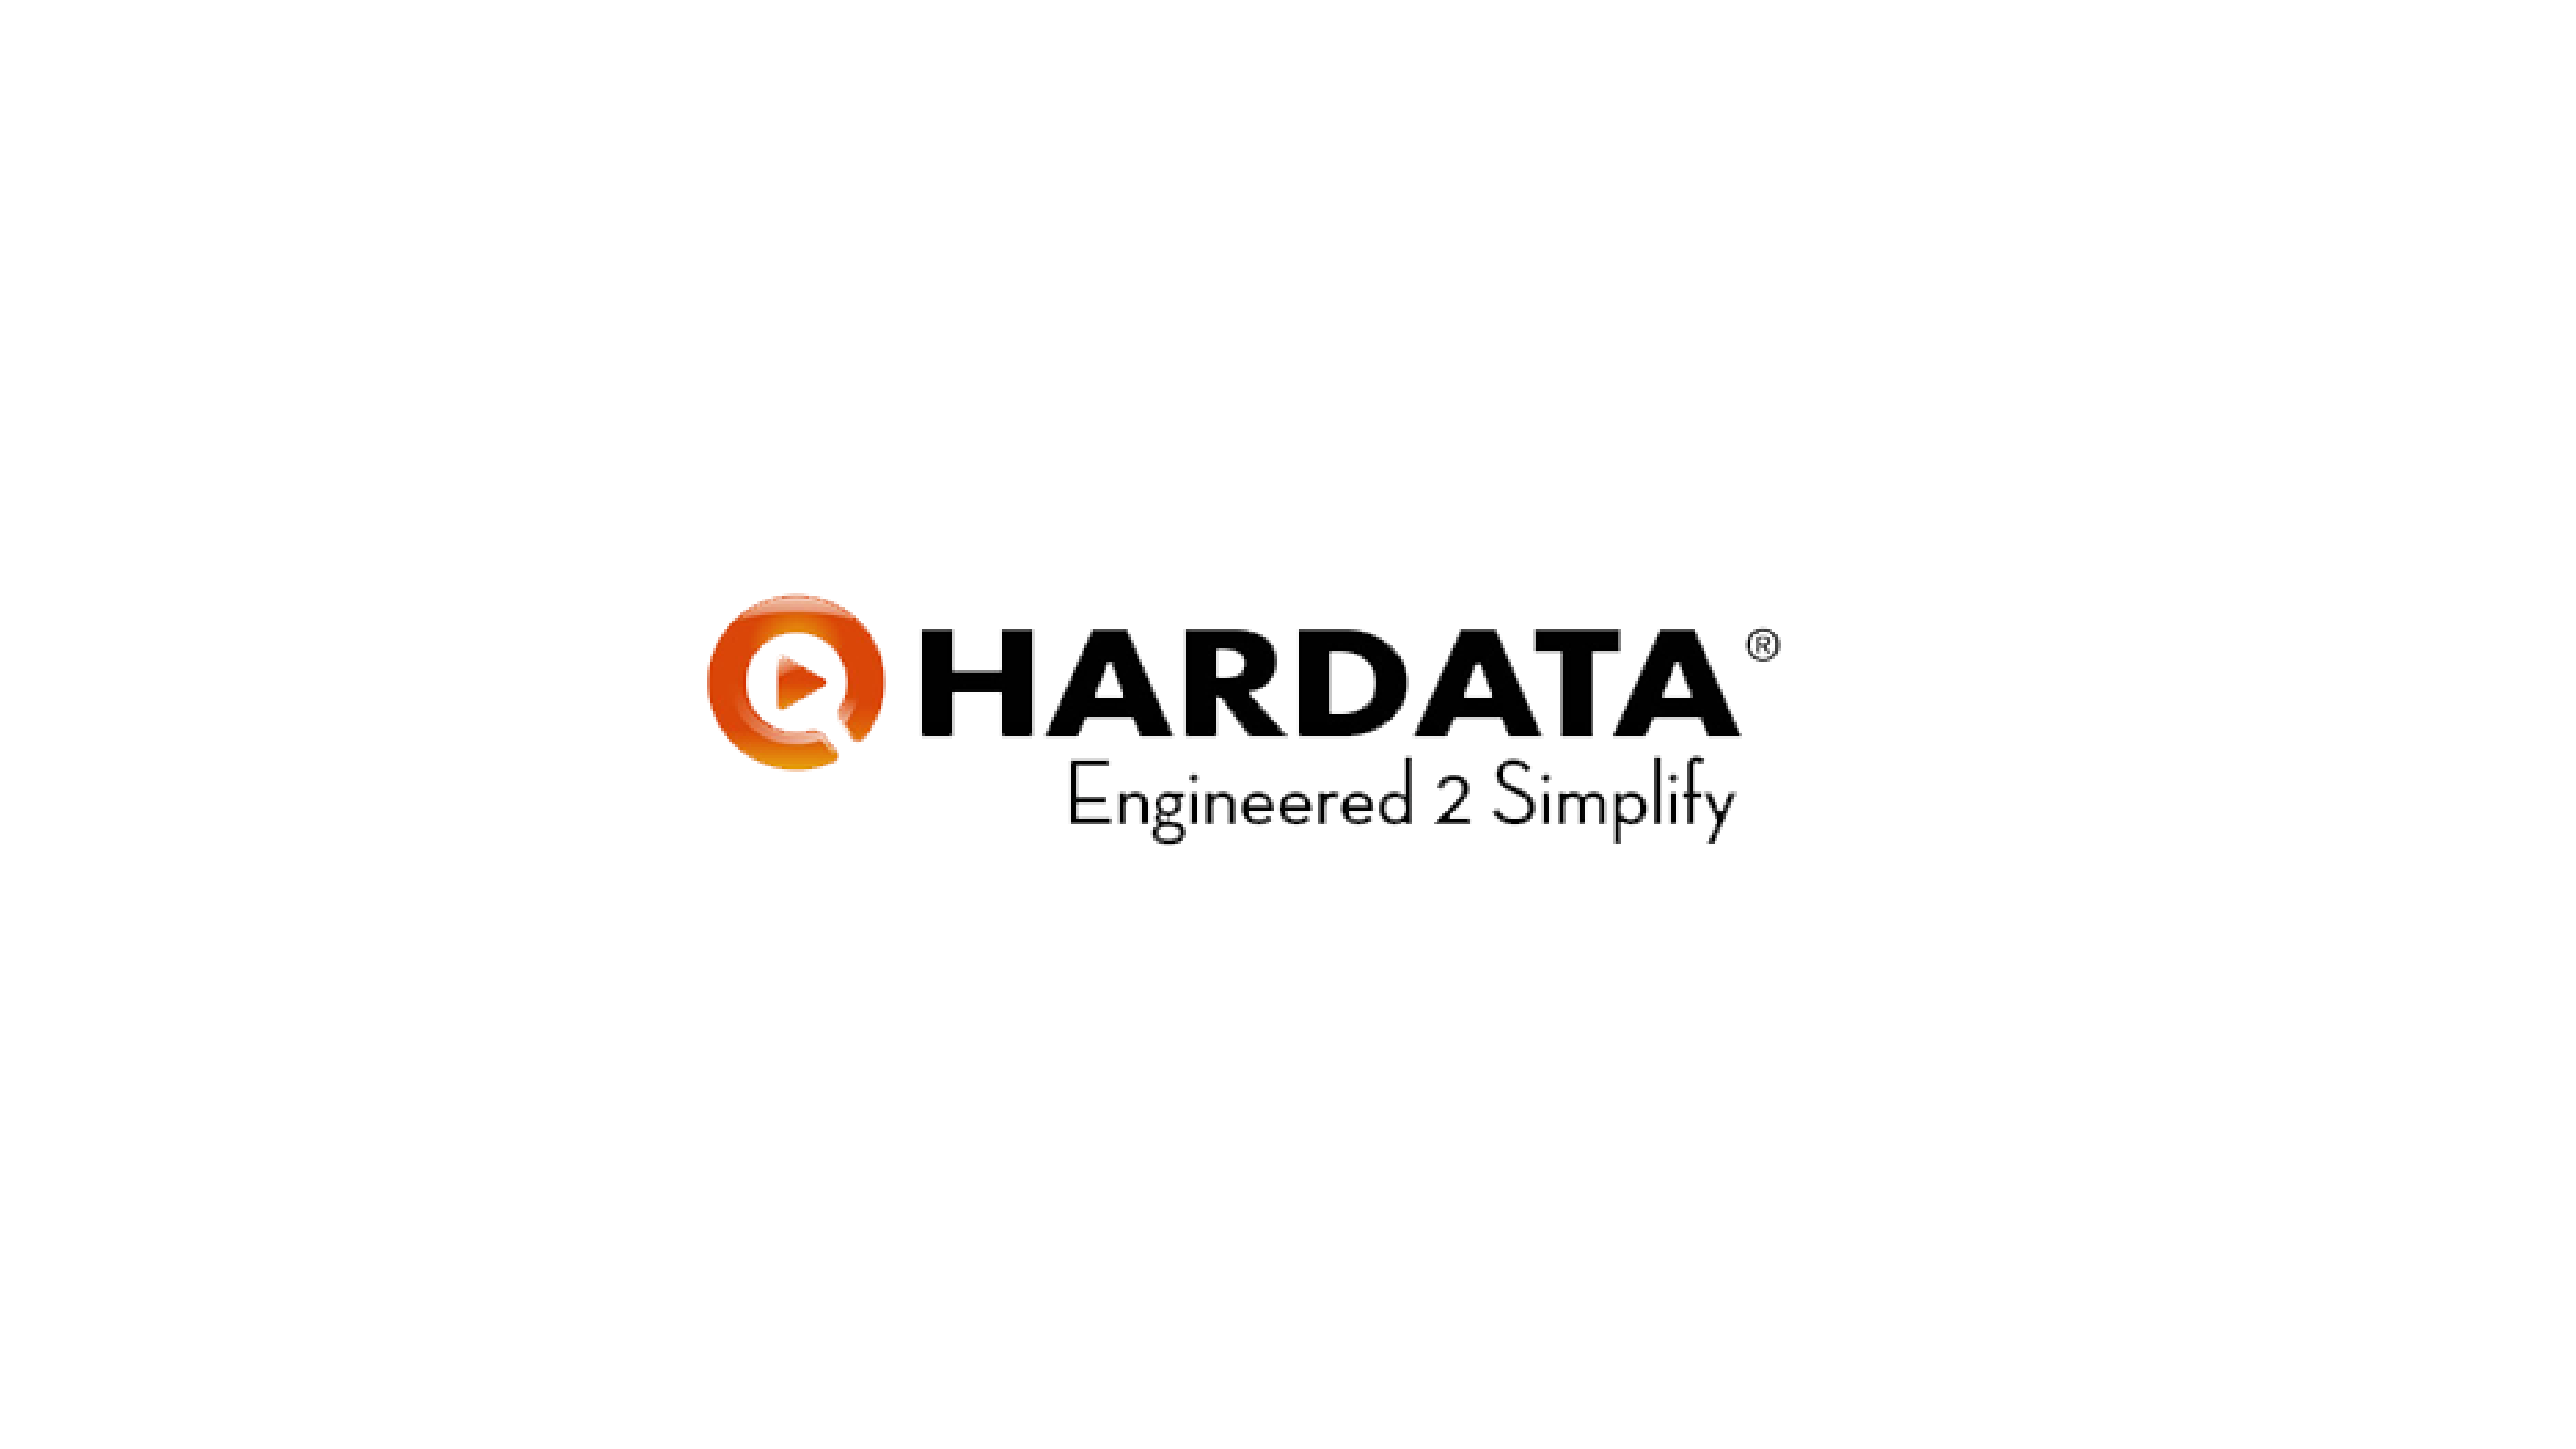 hardata